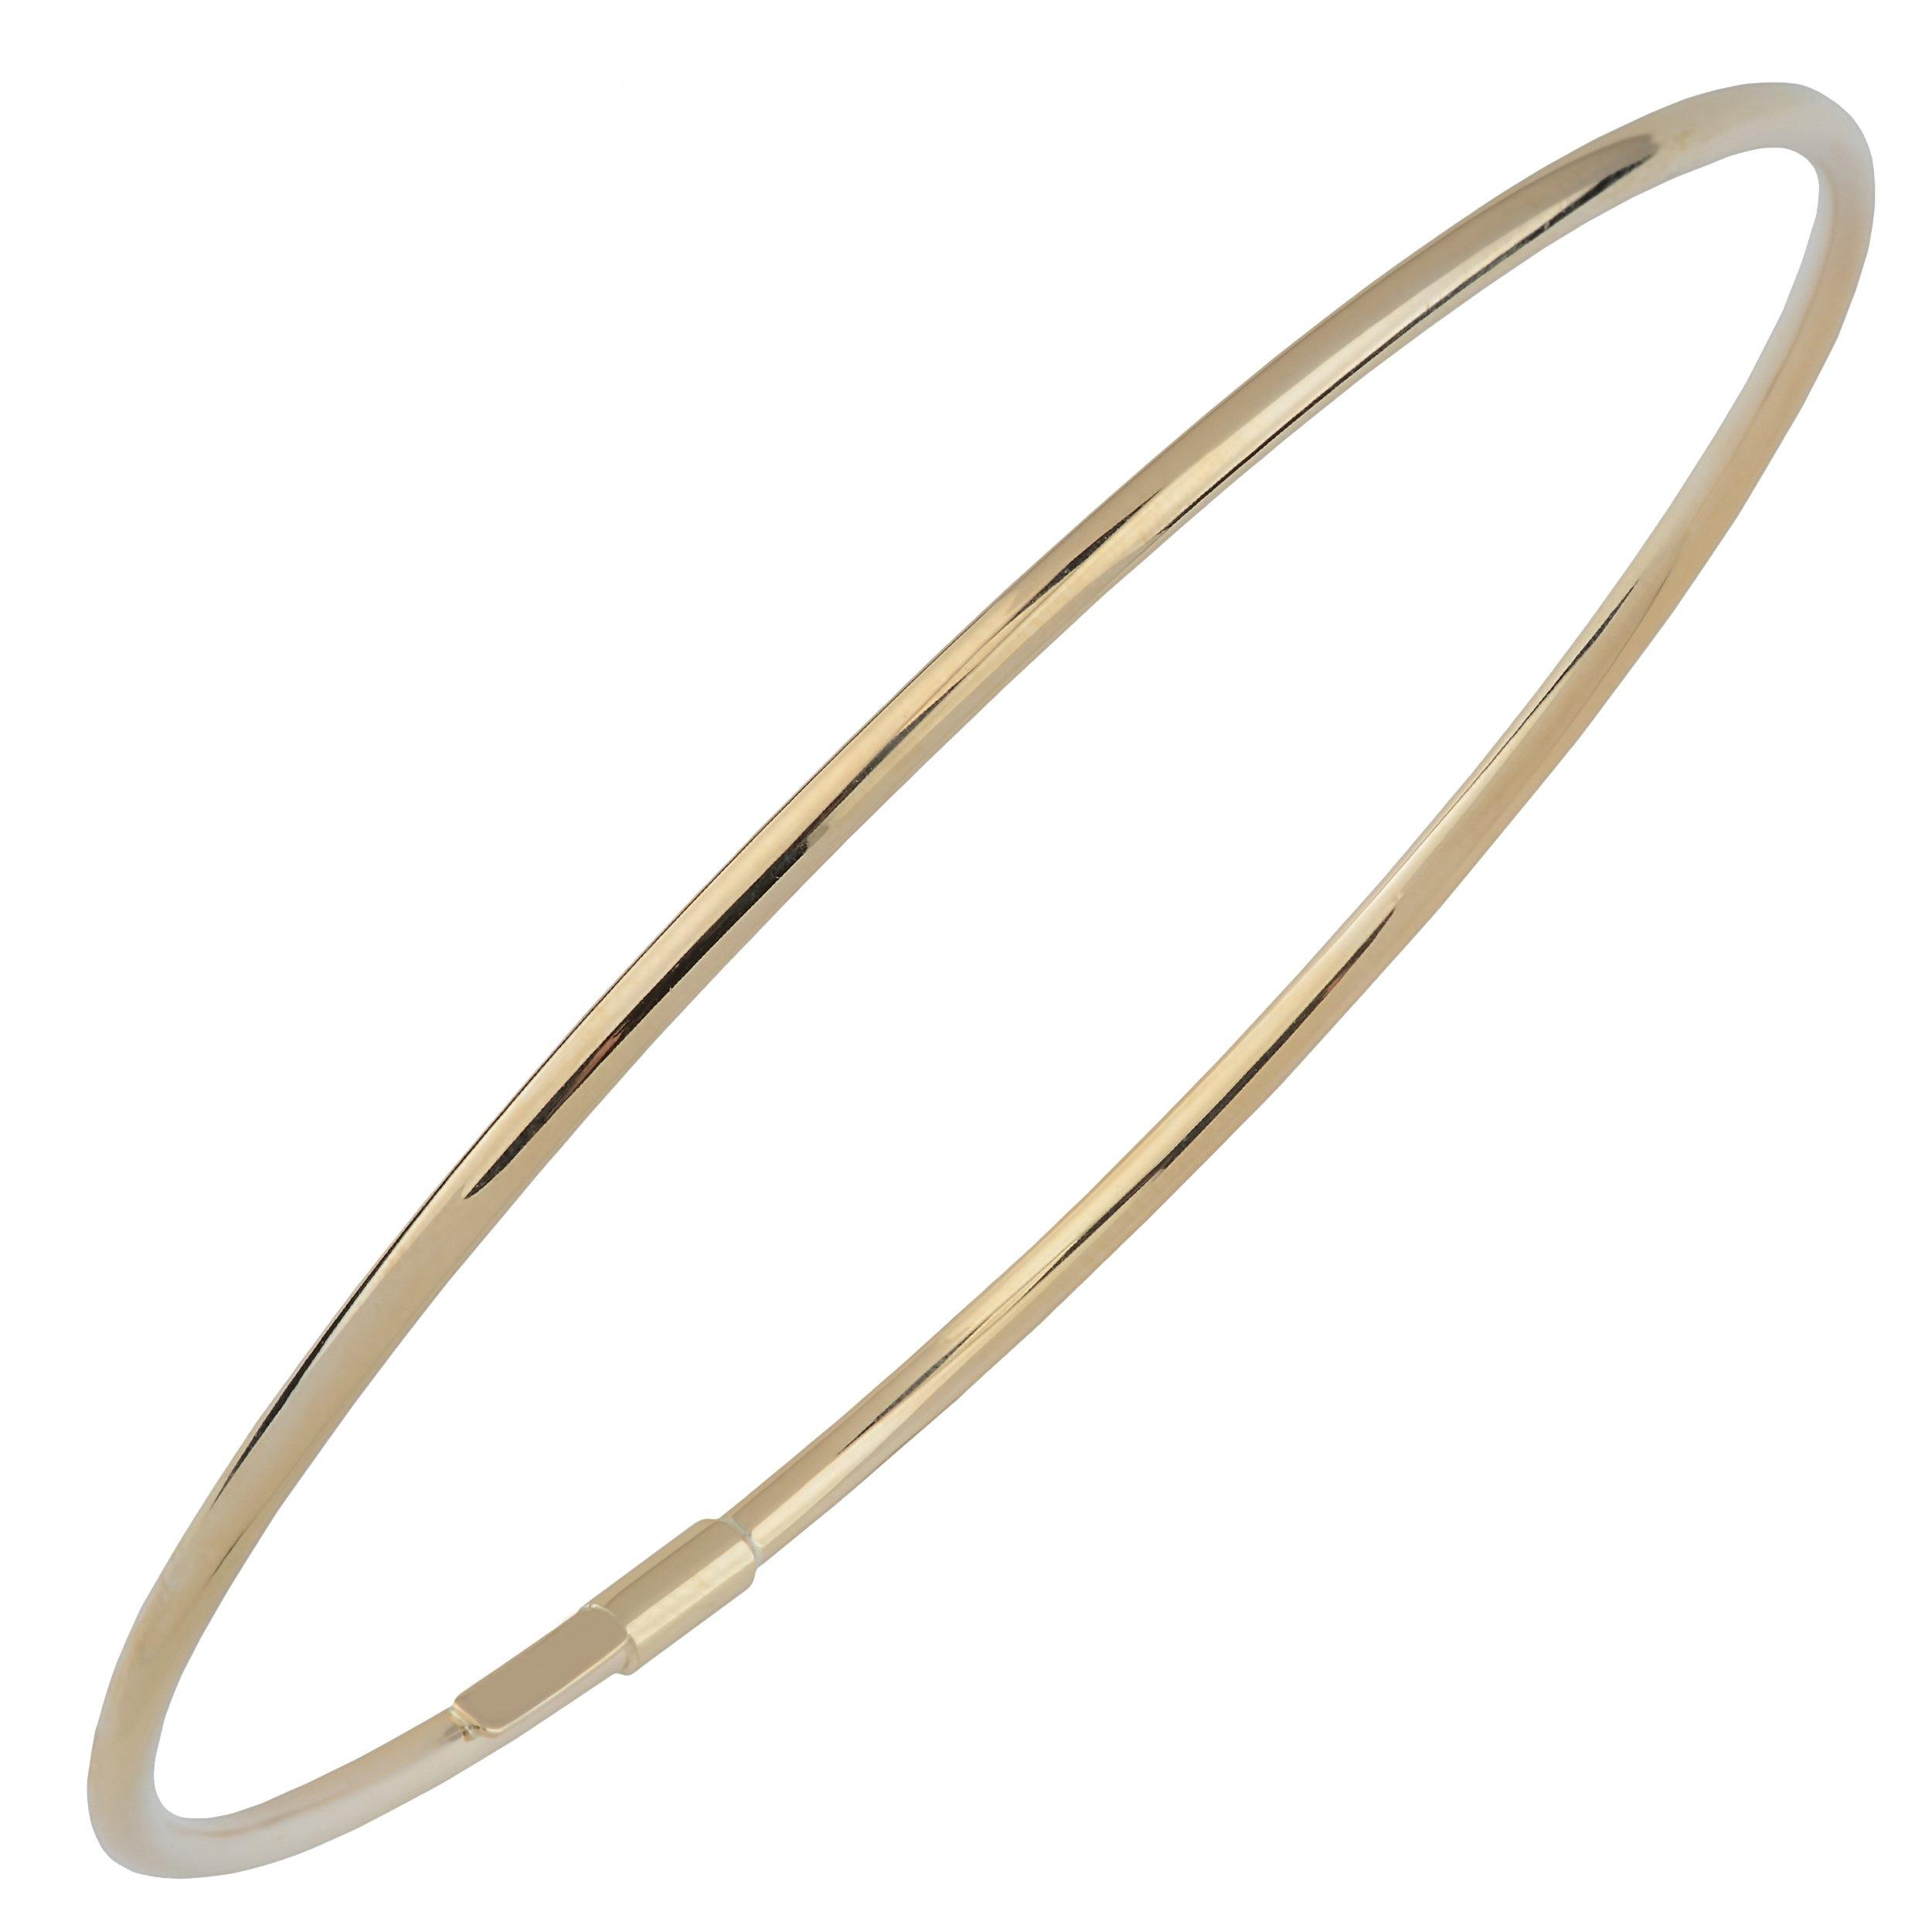 Kooljewelry 14k Yellow Gold 2mm High Polish Slip-on Bangle Bracelet